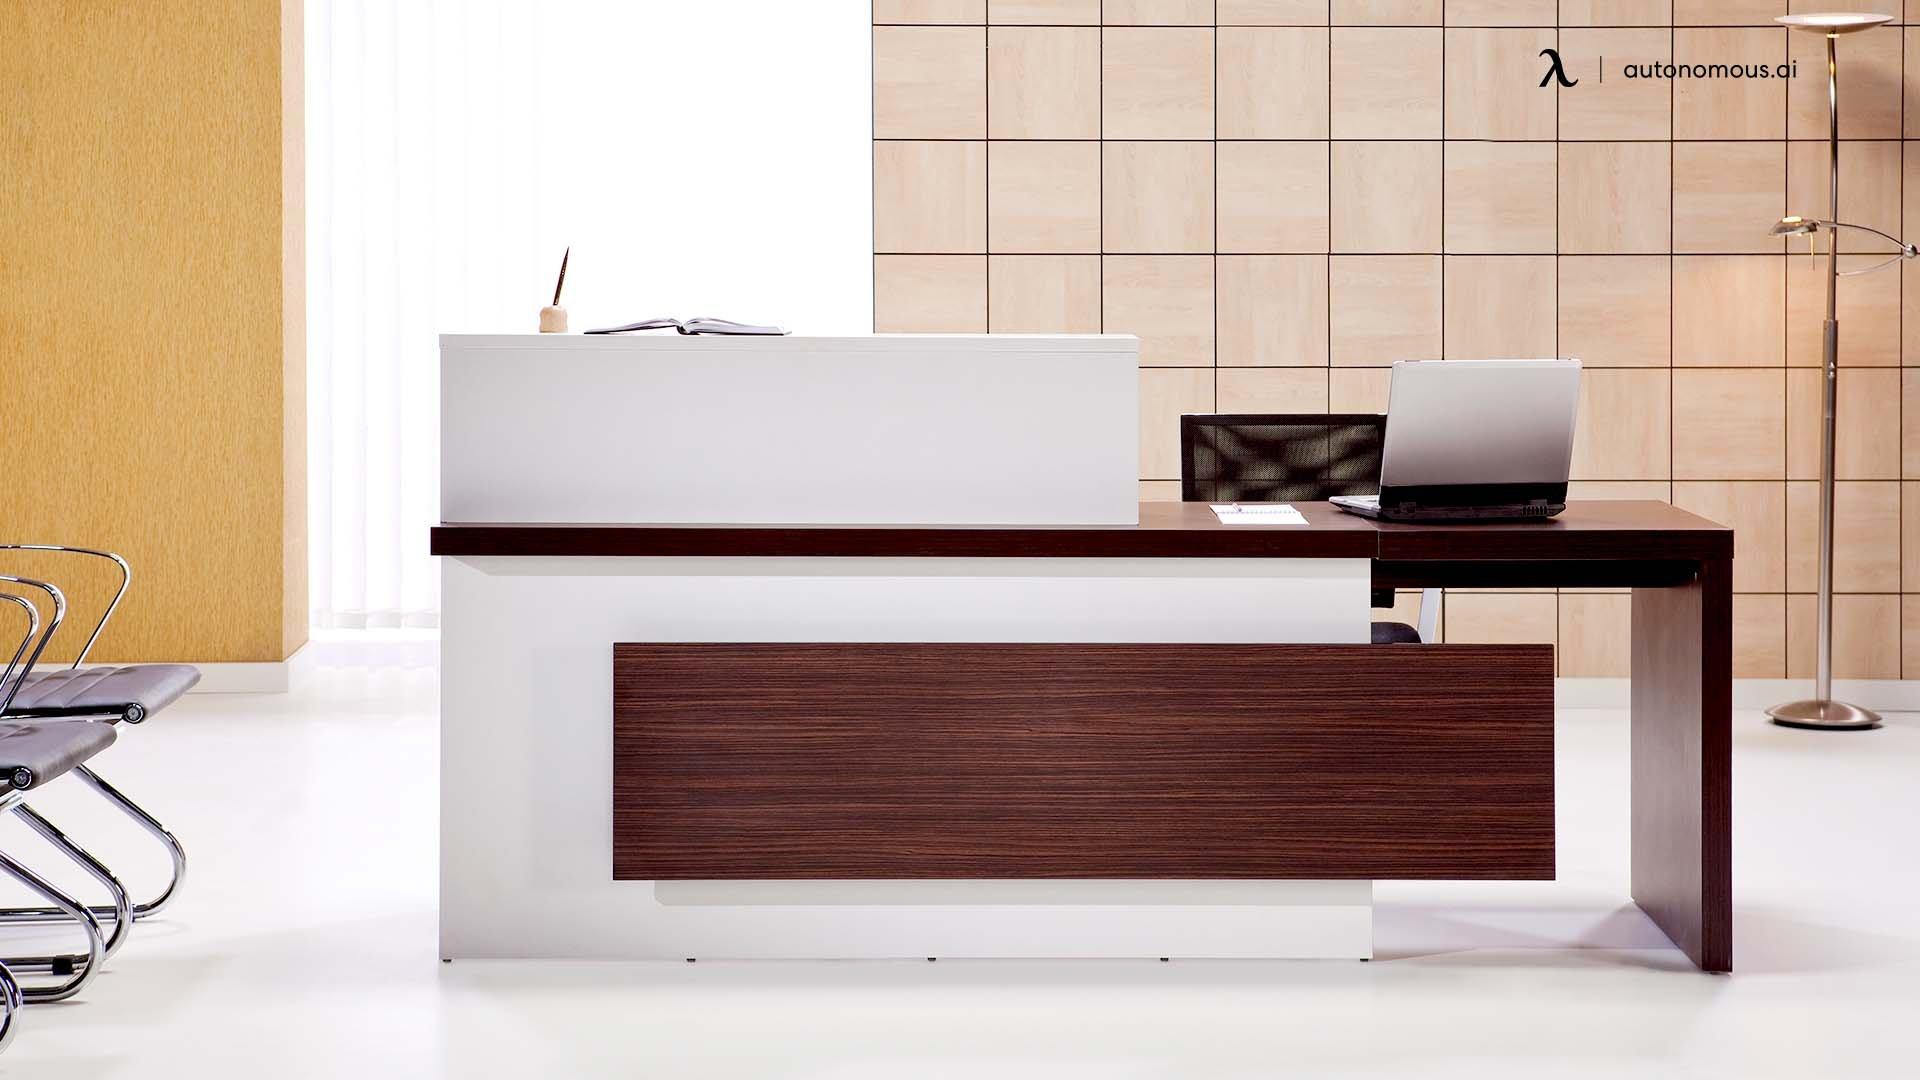 Aesthetic reception desk